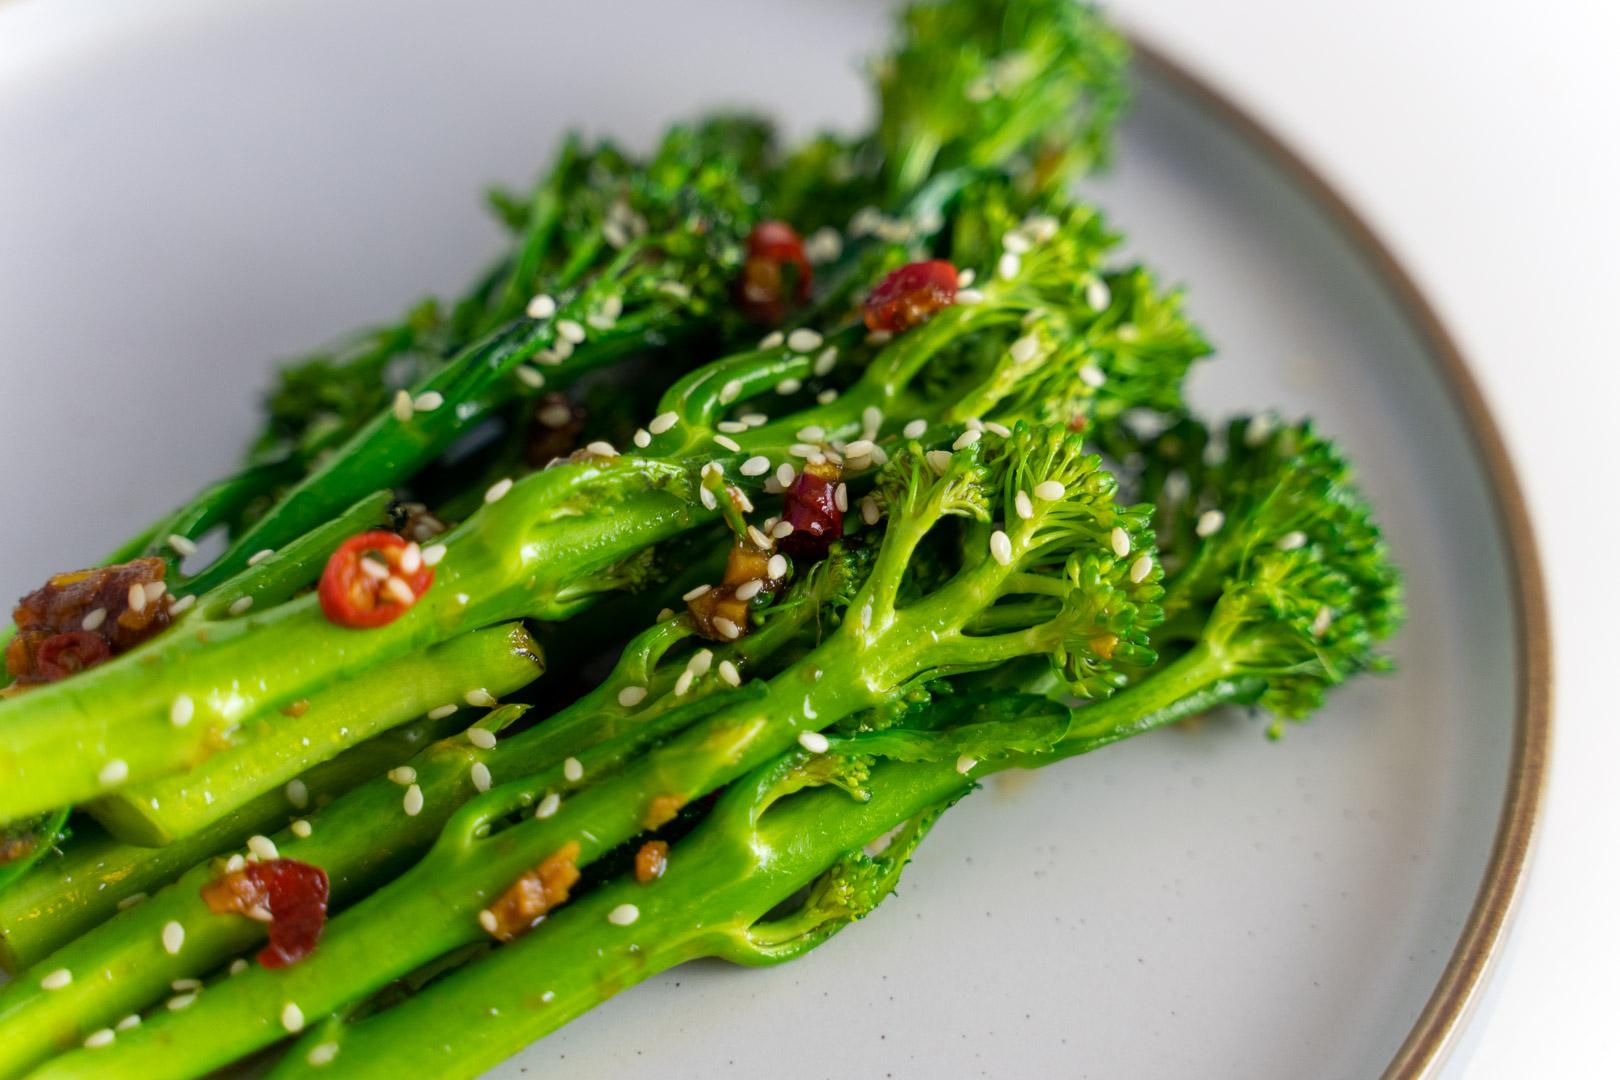 Chilli And Garlic Tenderstem Broccoli Stir Fry Recipe!